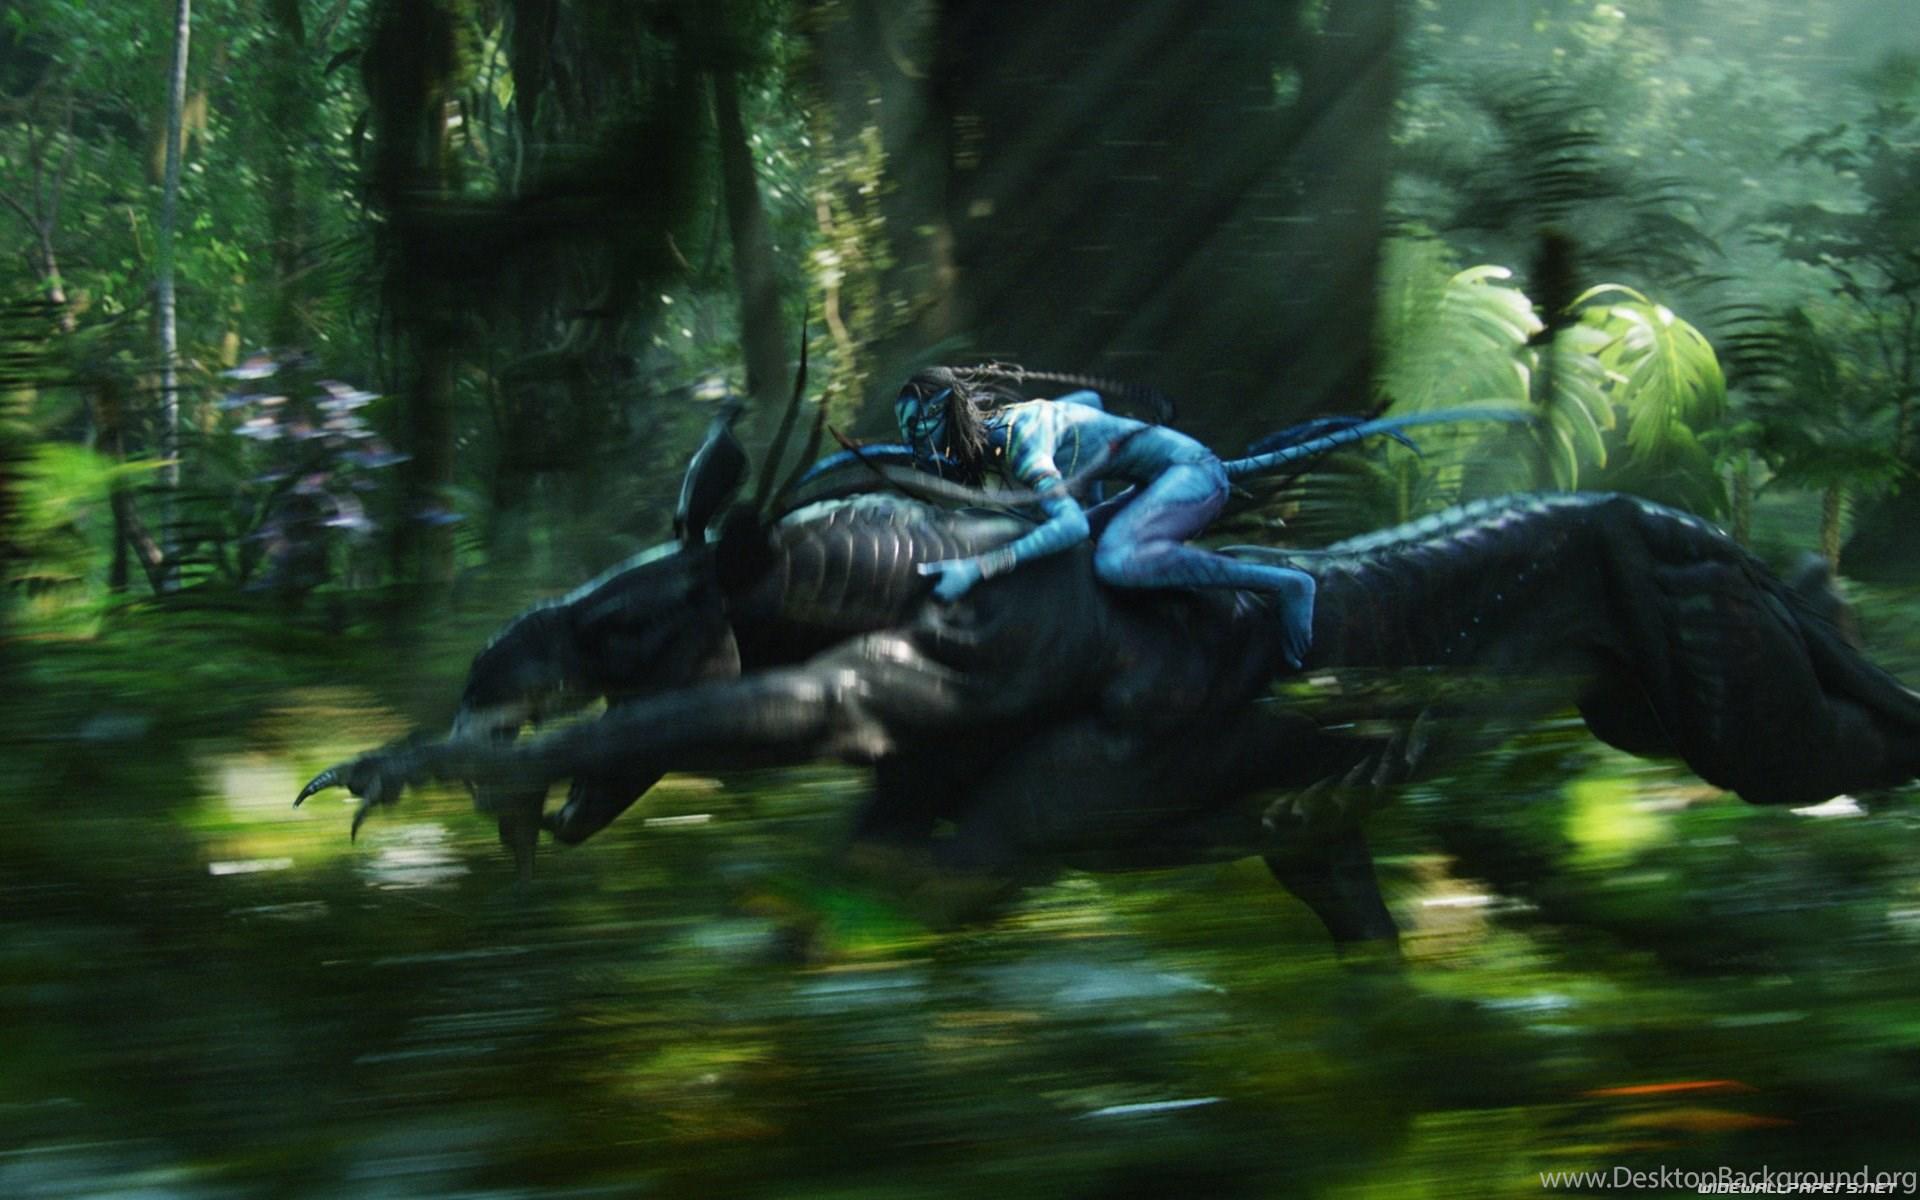 Avatar 2009 Movie 3d Hd Wallpapers Desktop Background